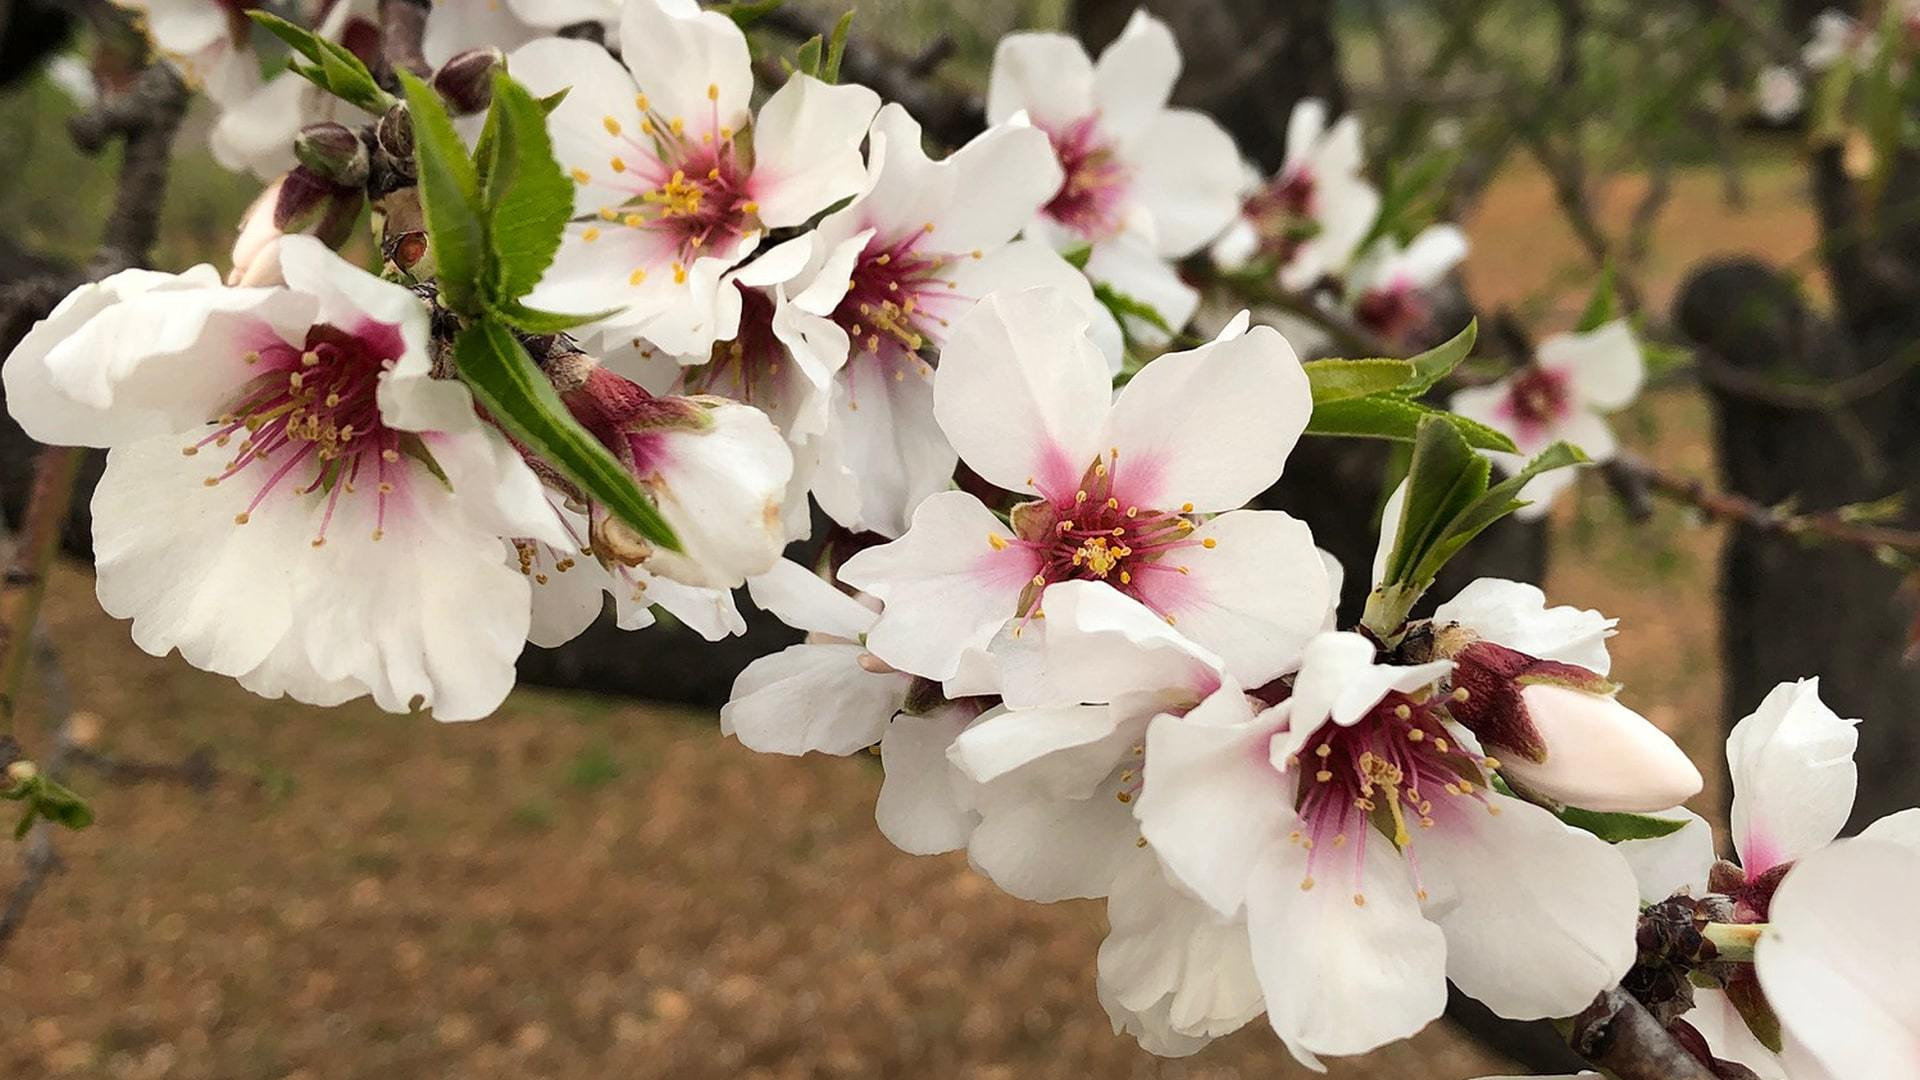 Almond Blossom Photo Contest Mallorca Katarina Nillson min